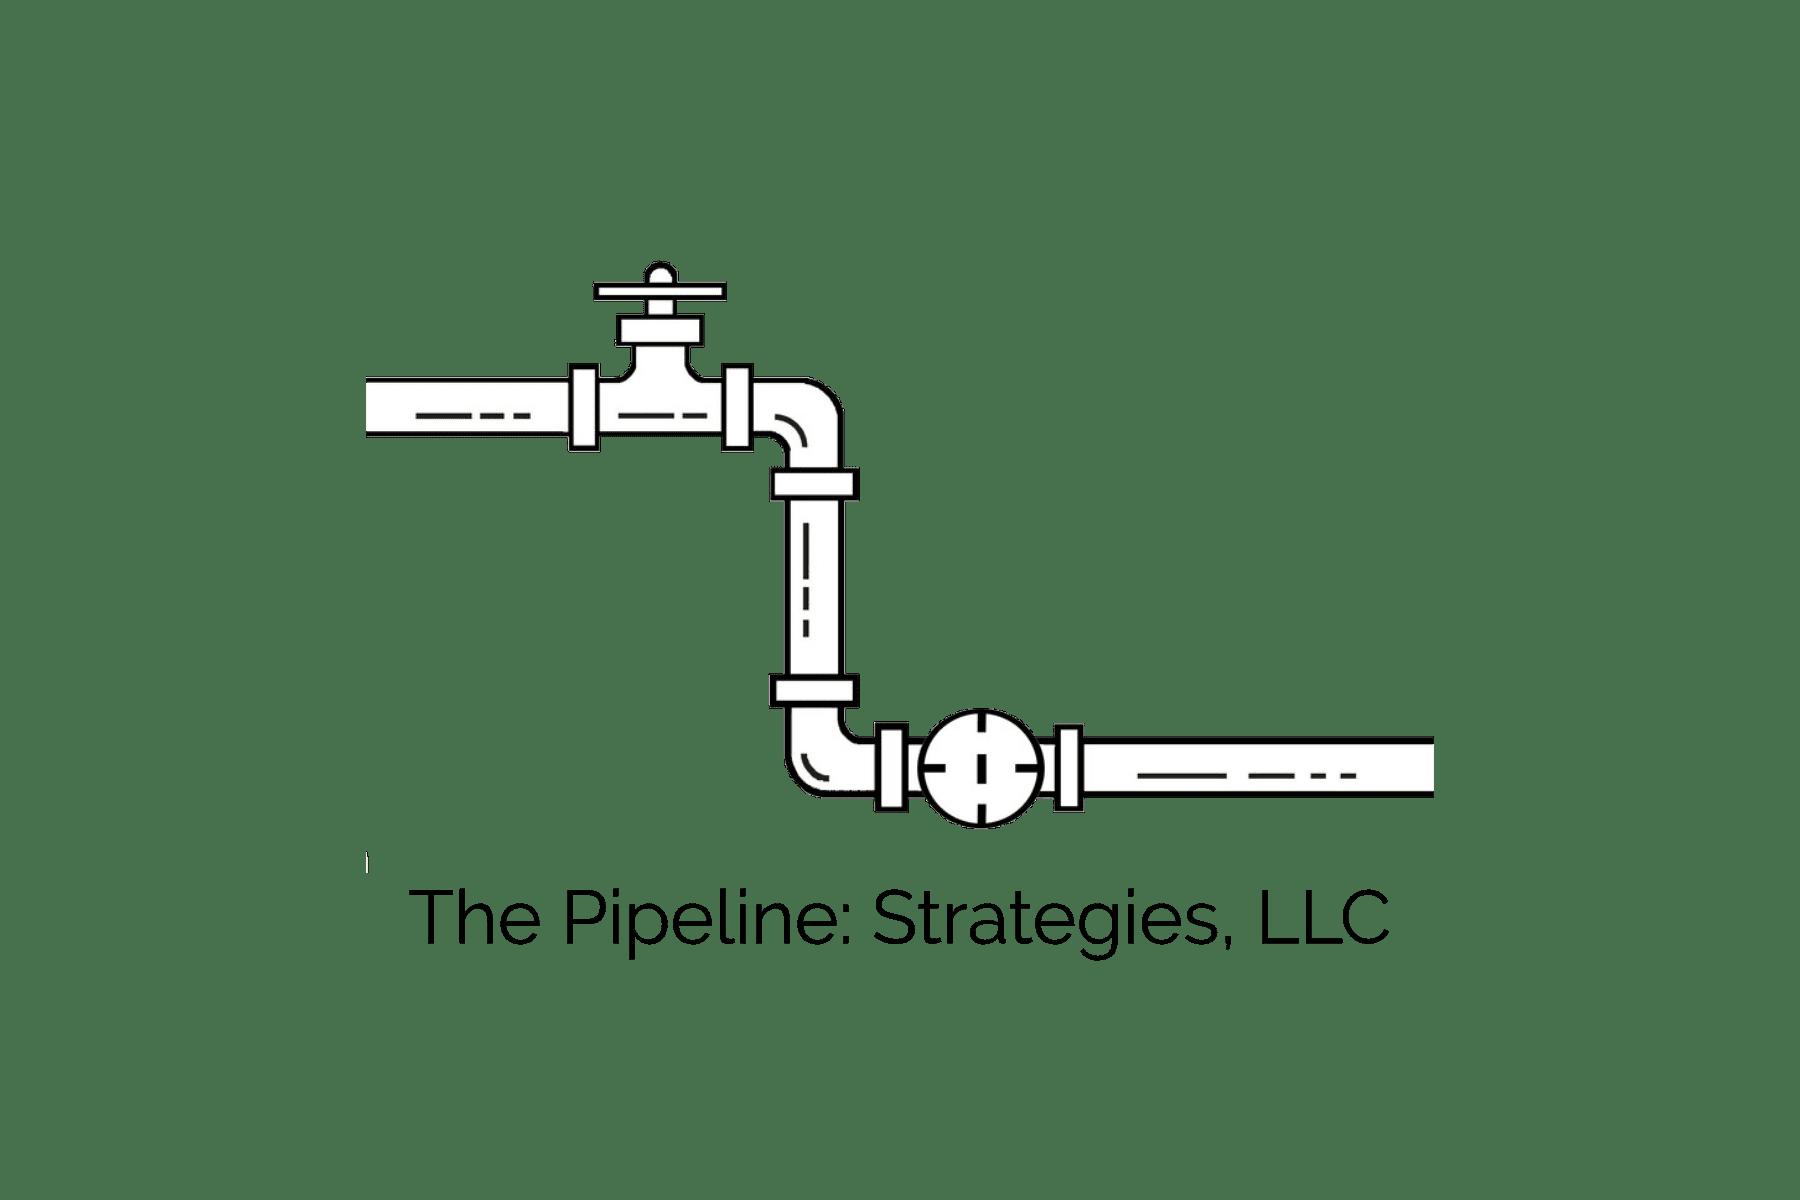 The Pipeline Strategies